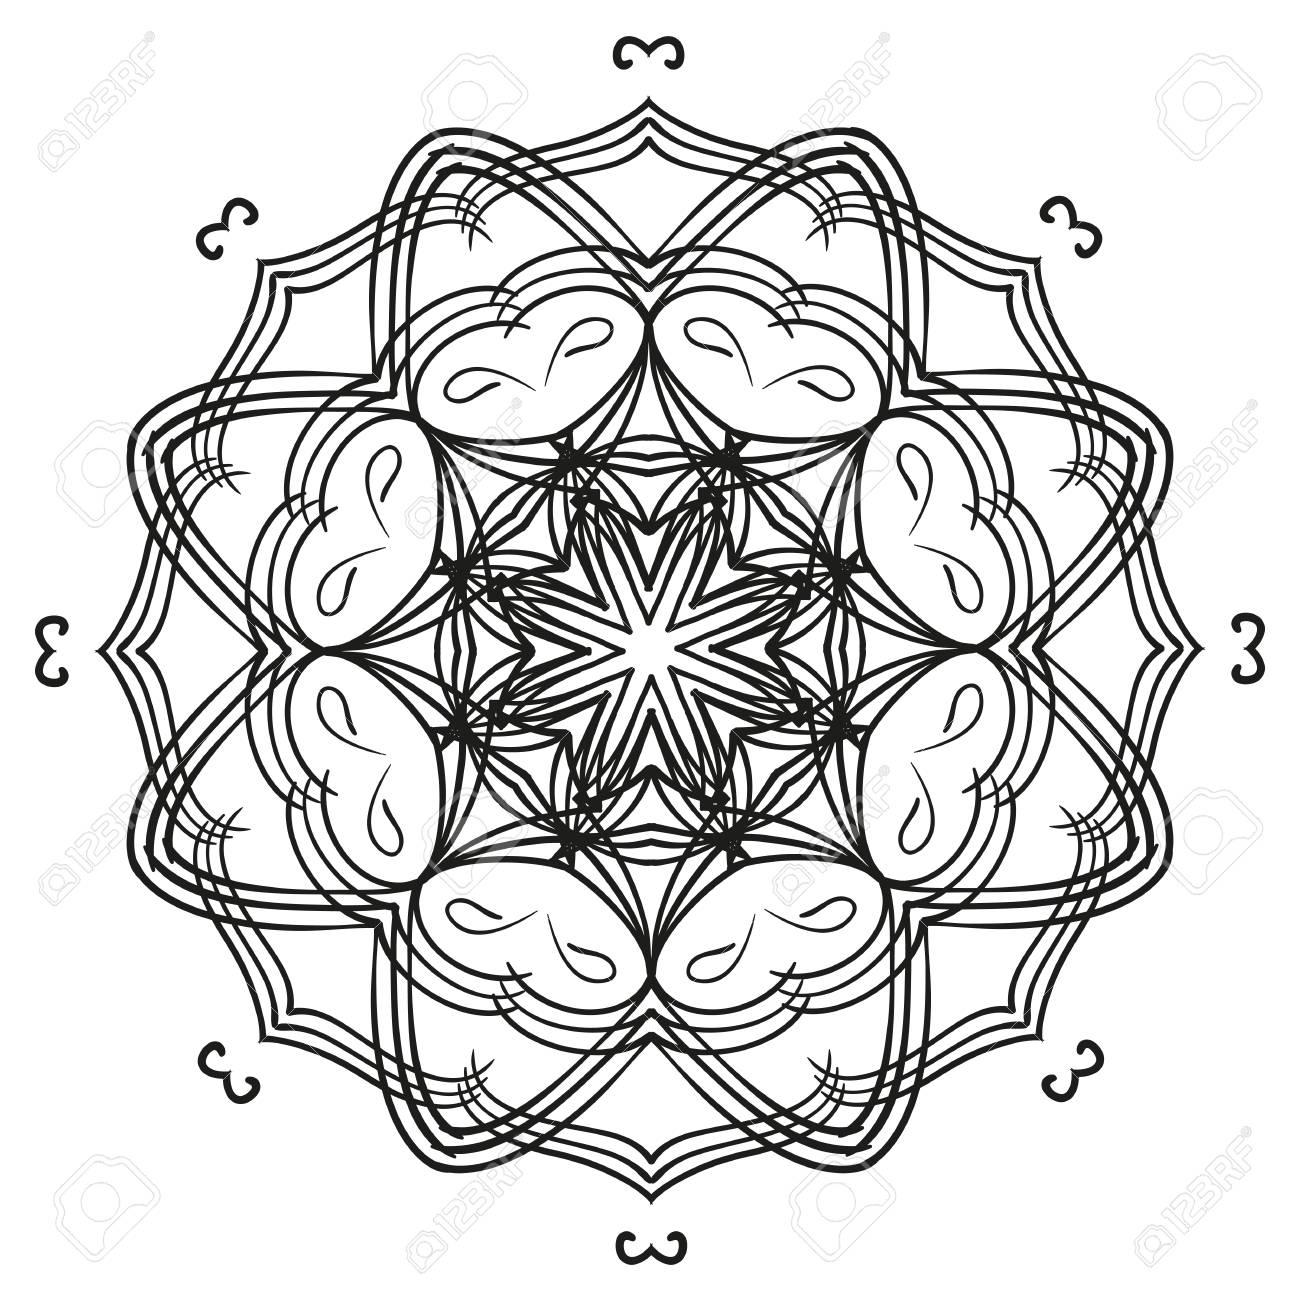 Contorno Intrincado Mandala Ornamento Floral Circular. Elemento De ...